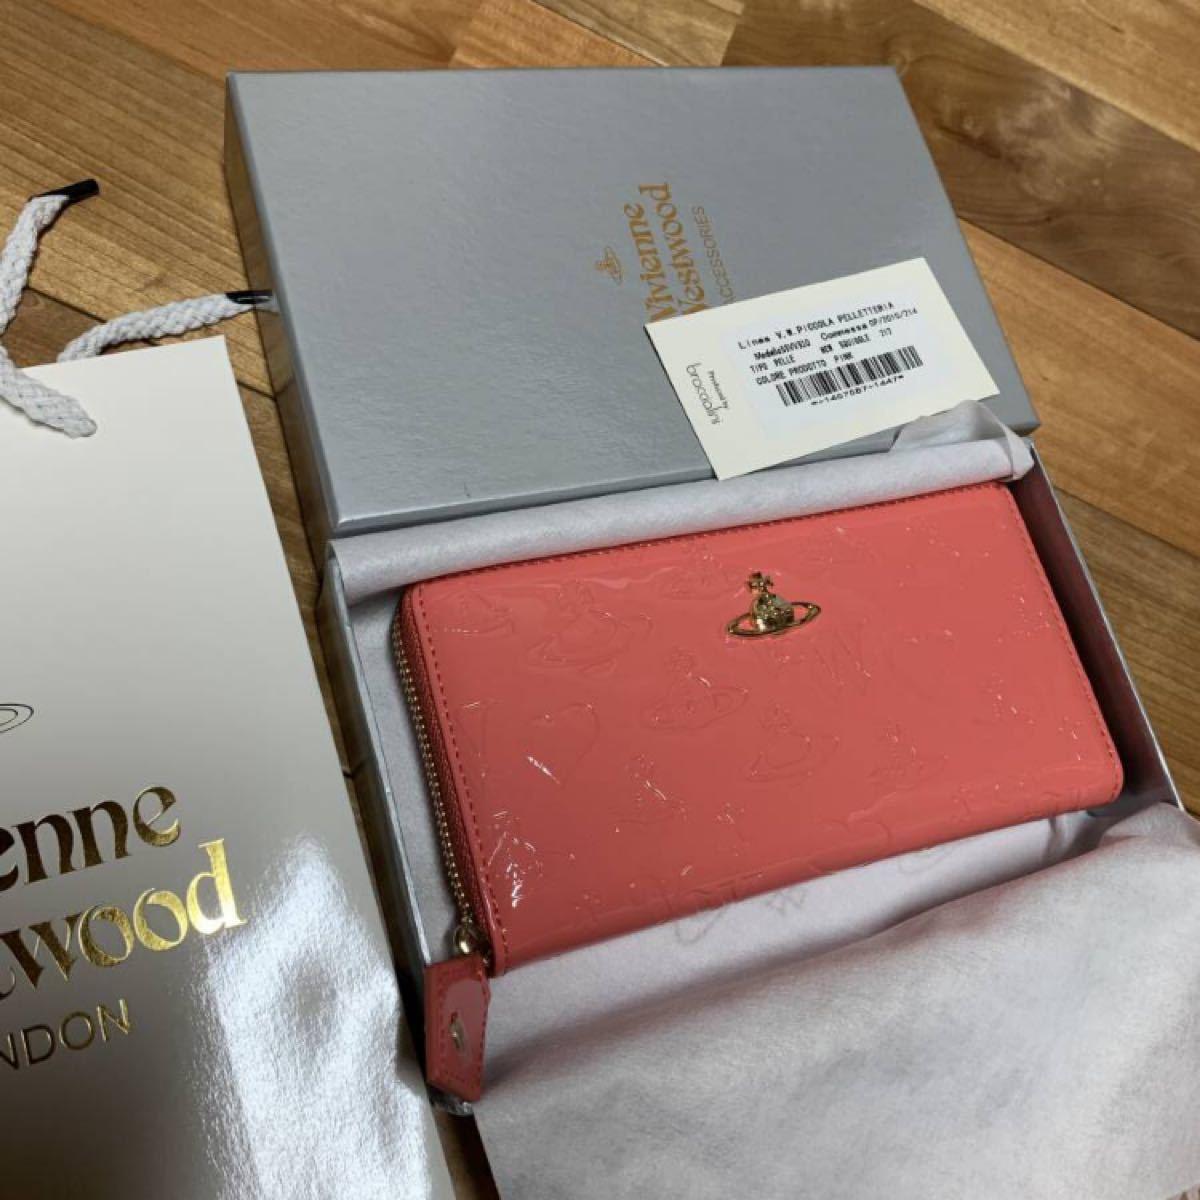 Vivienne Westwood ヴィヴィアンウエストウッド 小銭入れ 長財布  ピンクエナメル